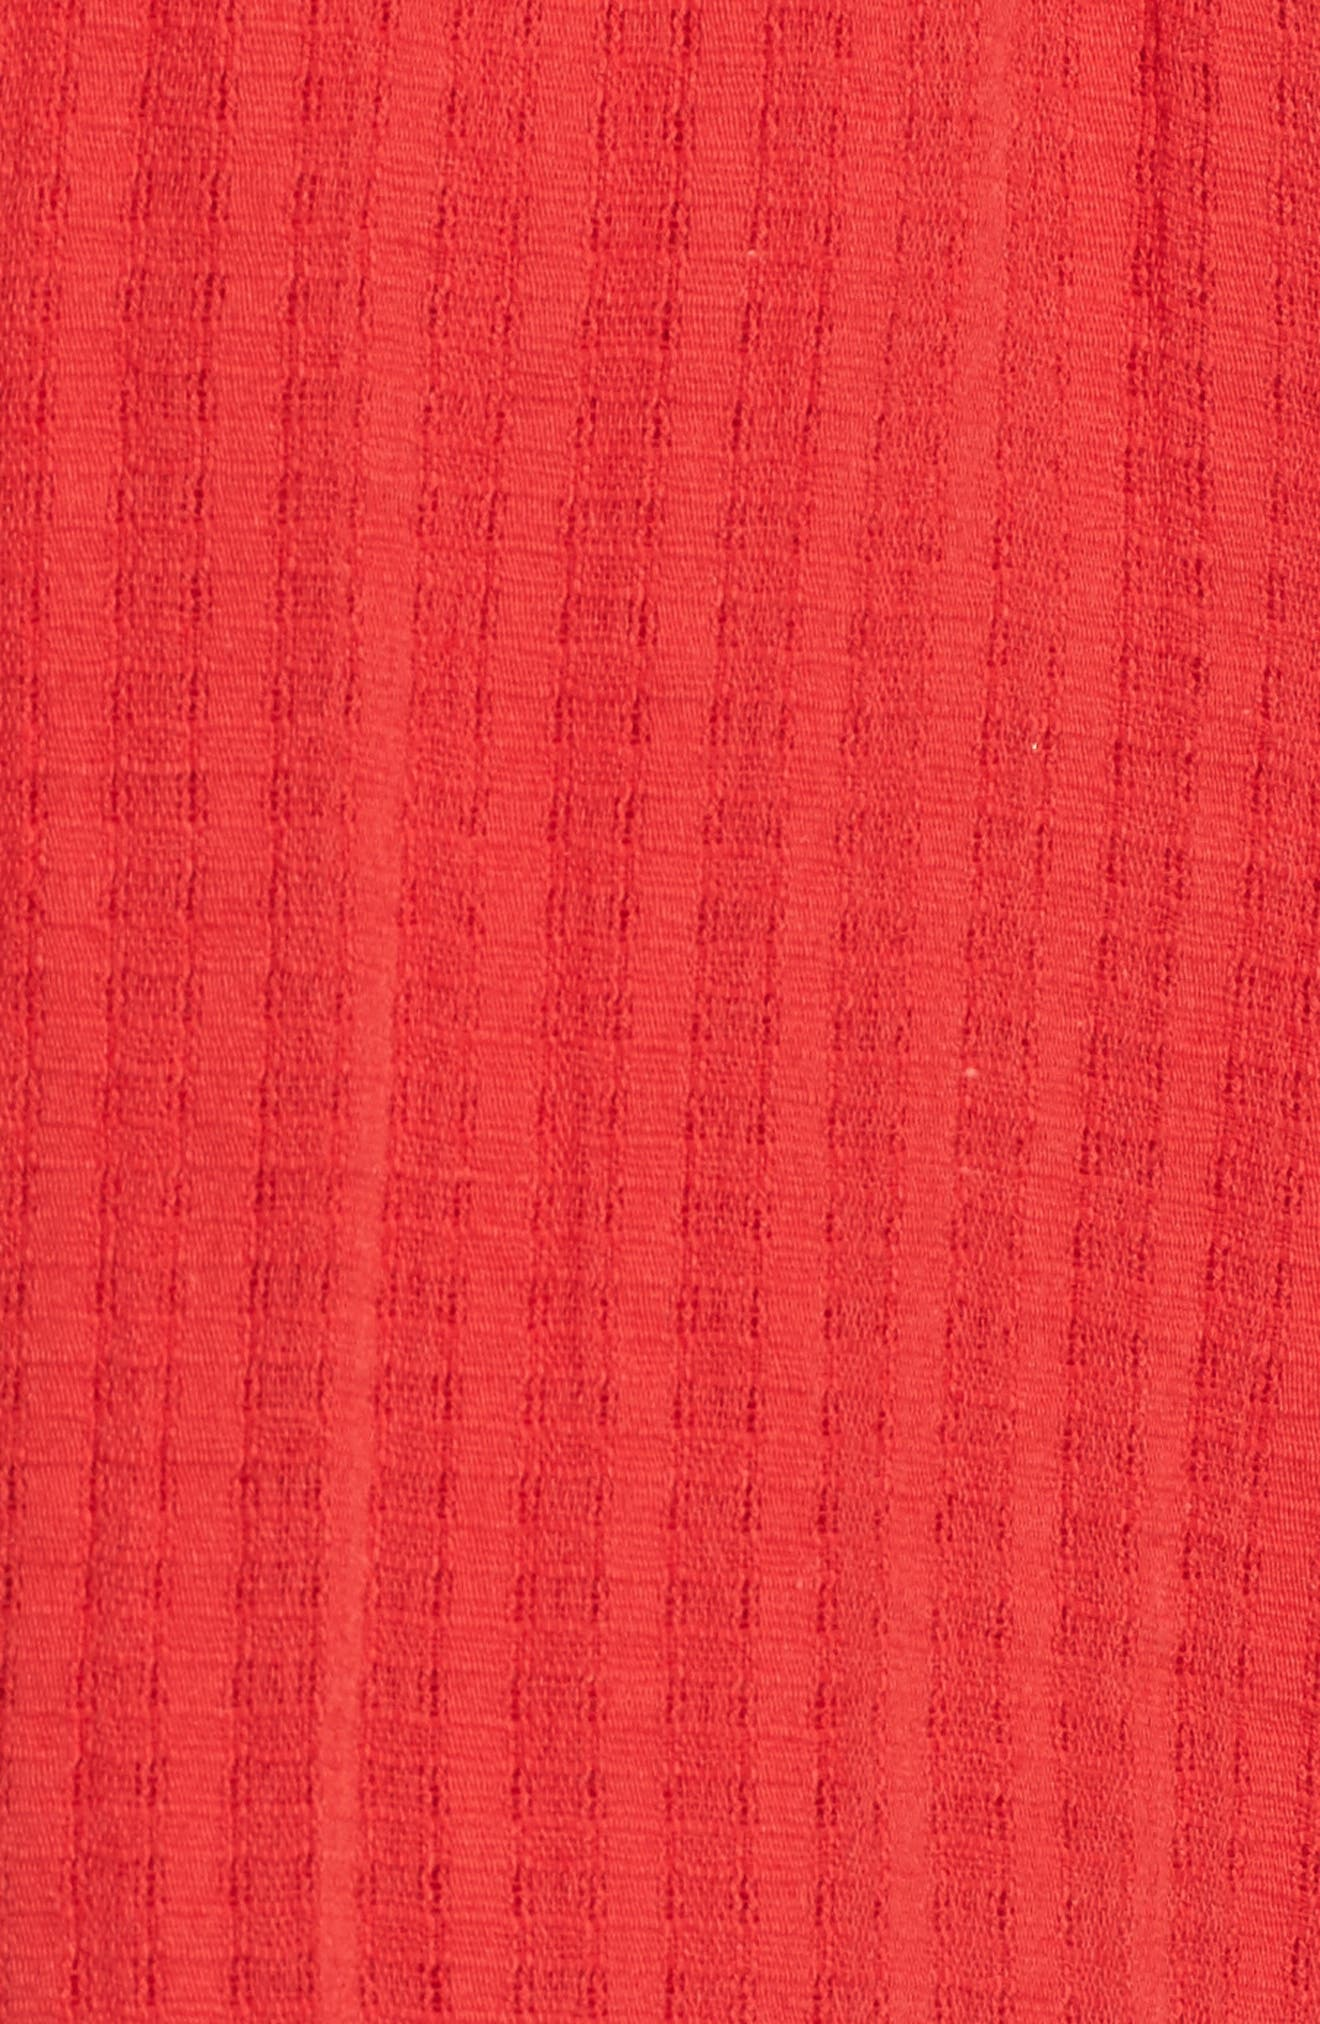 Pompom Trim Shorts,                             Alternate thumbnail 6, color,                             Red